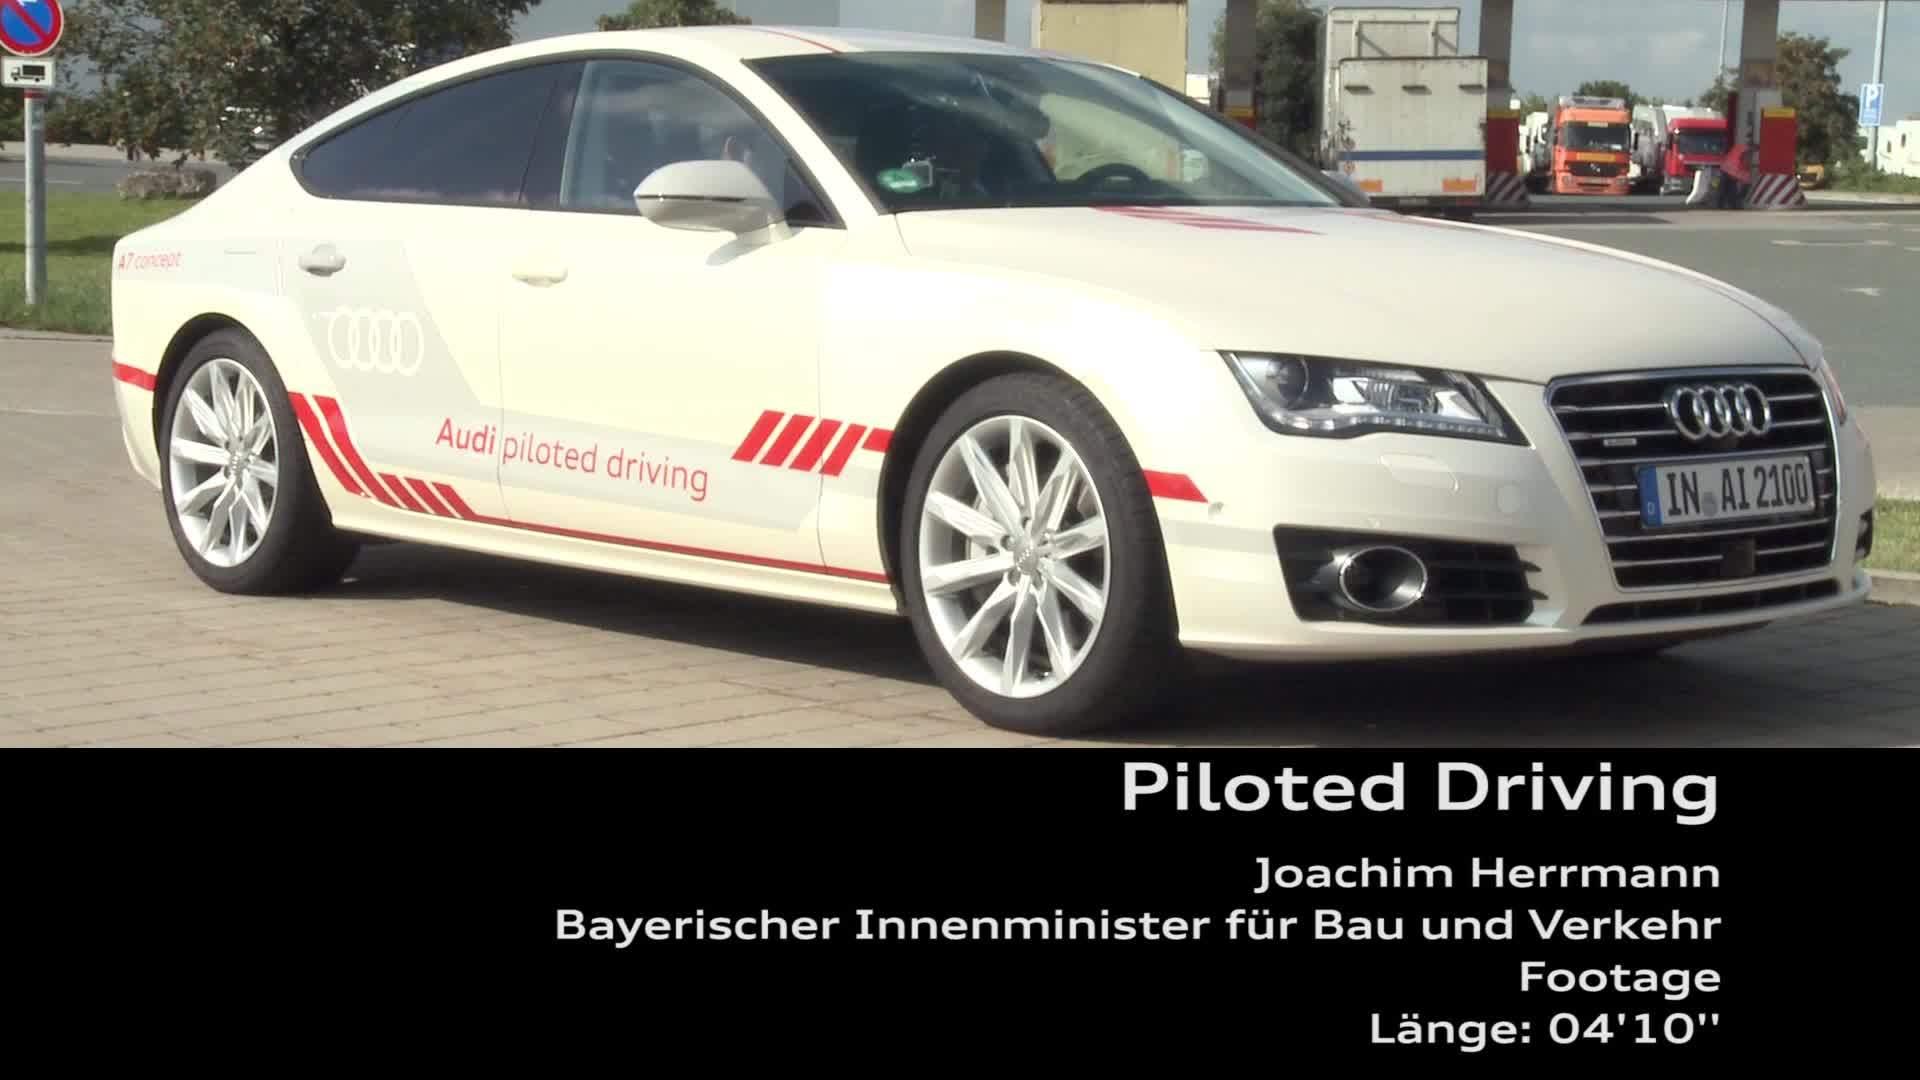 Piloted Driving - Minister Joachim Herrmann - Footage